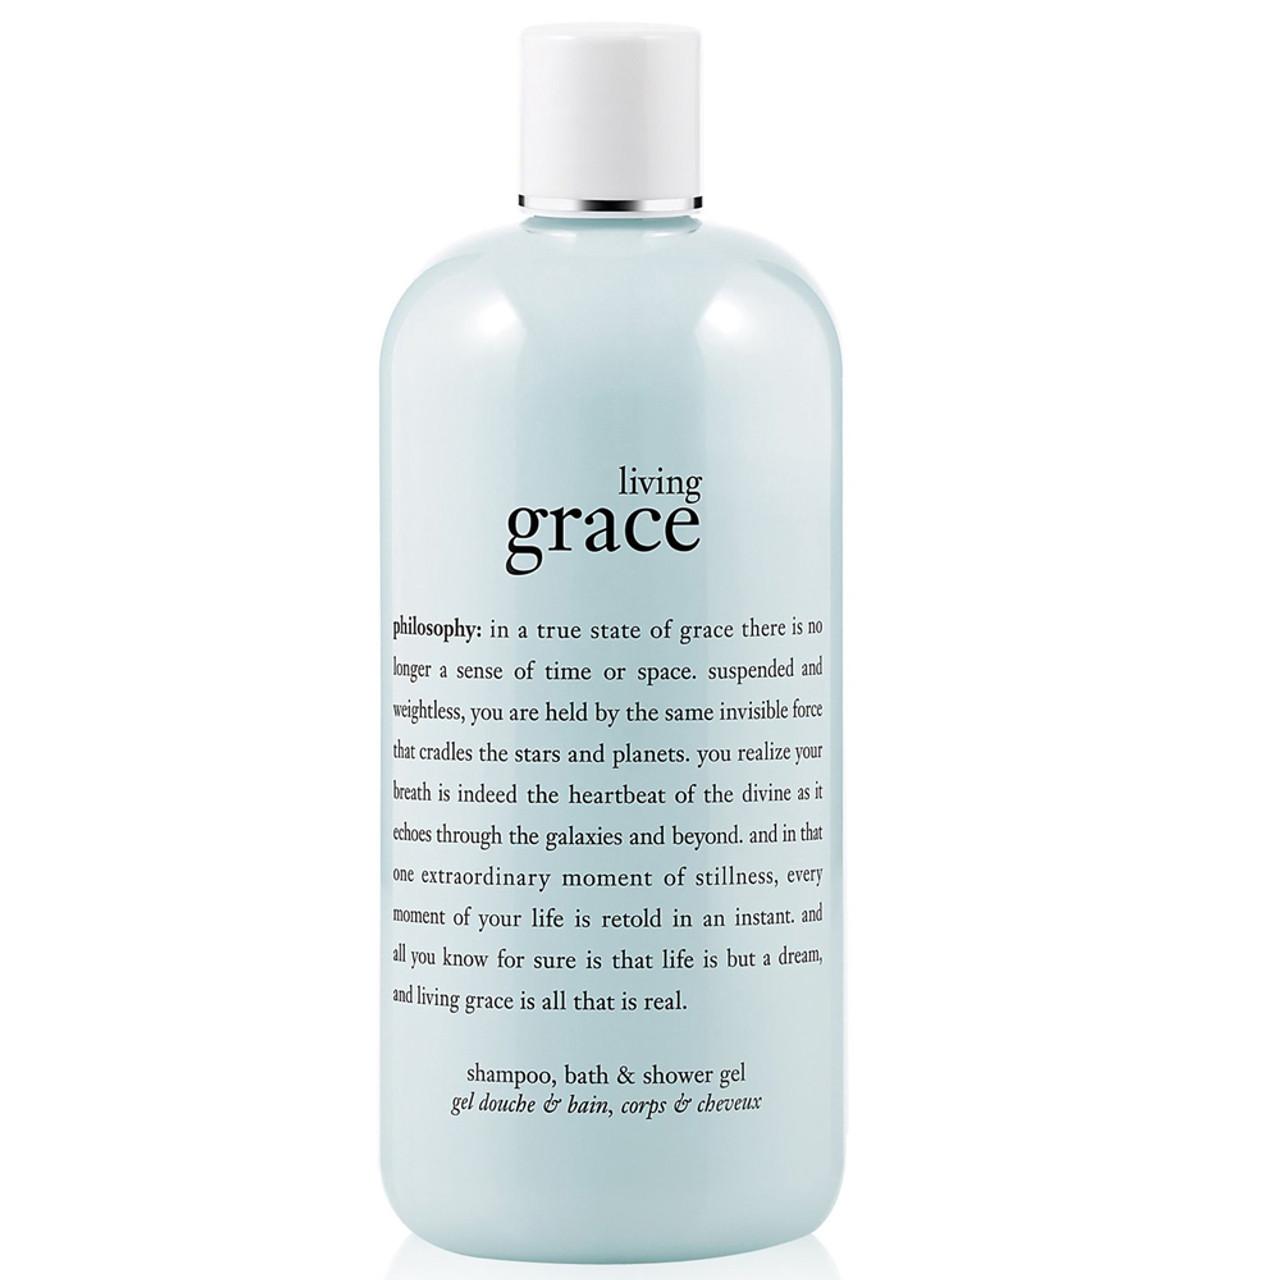 philosophy Living Grace Shower Gel BeautifiedYou.com